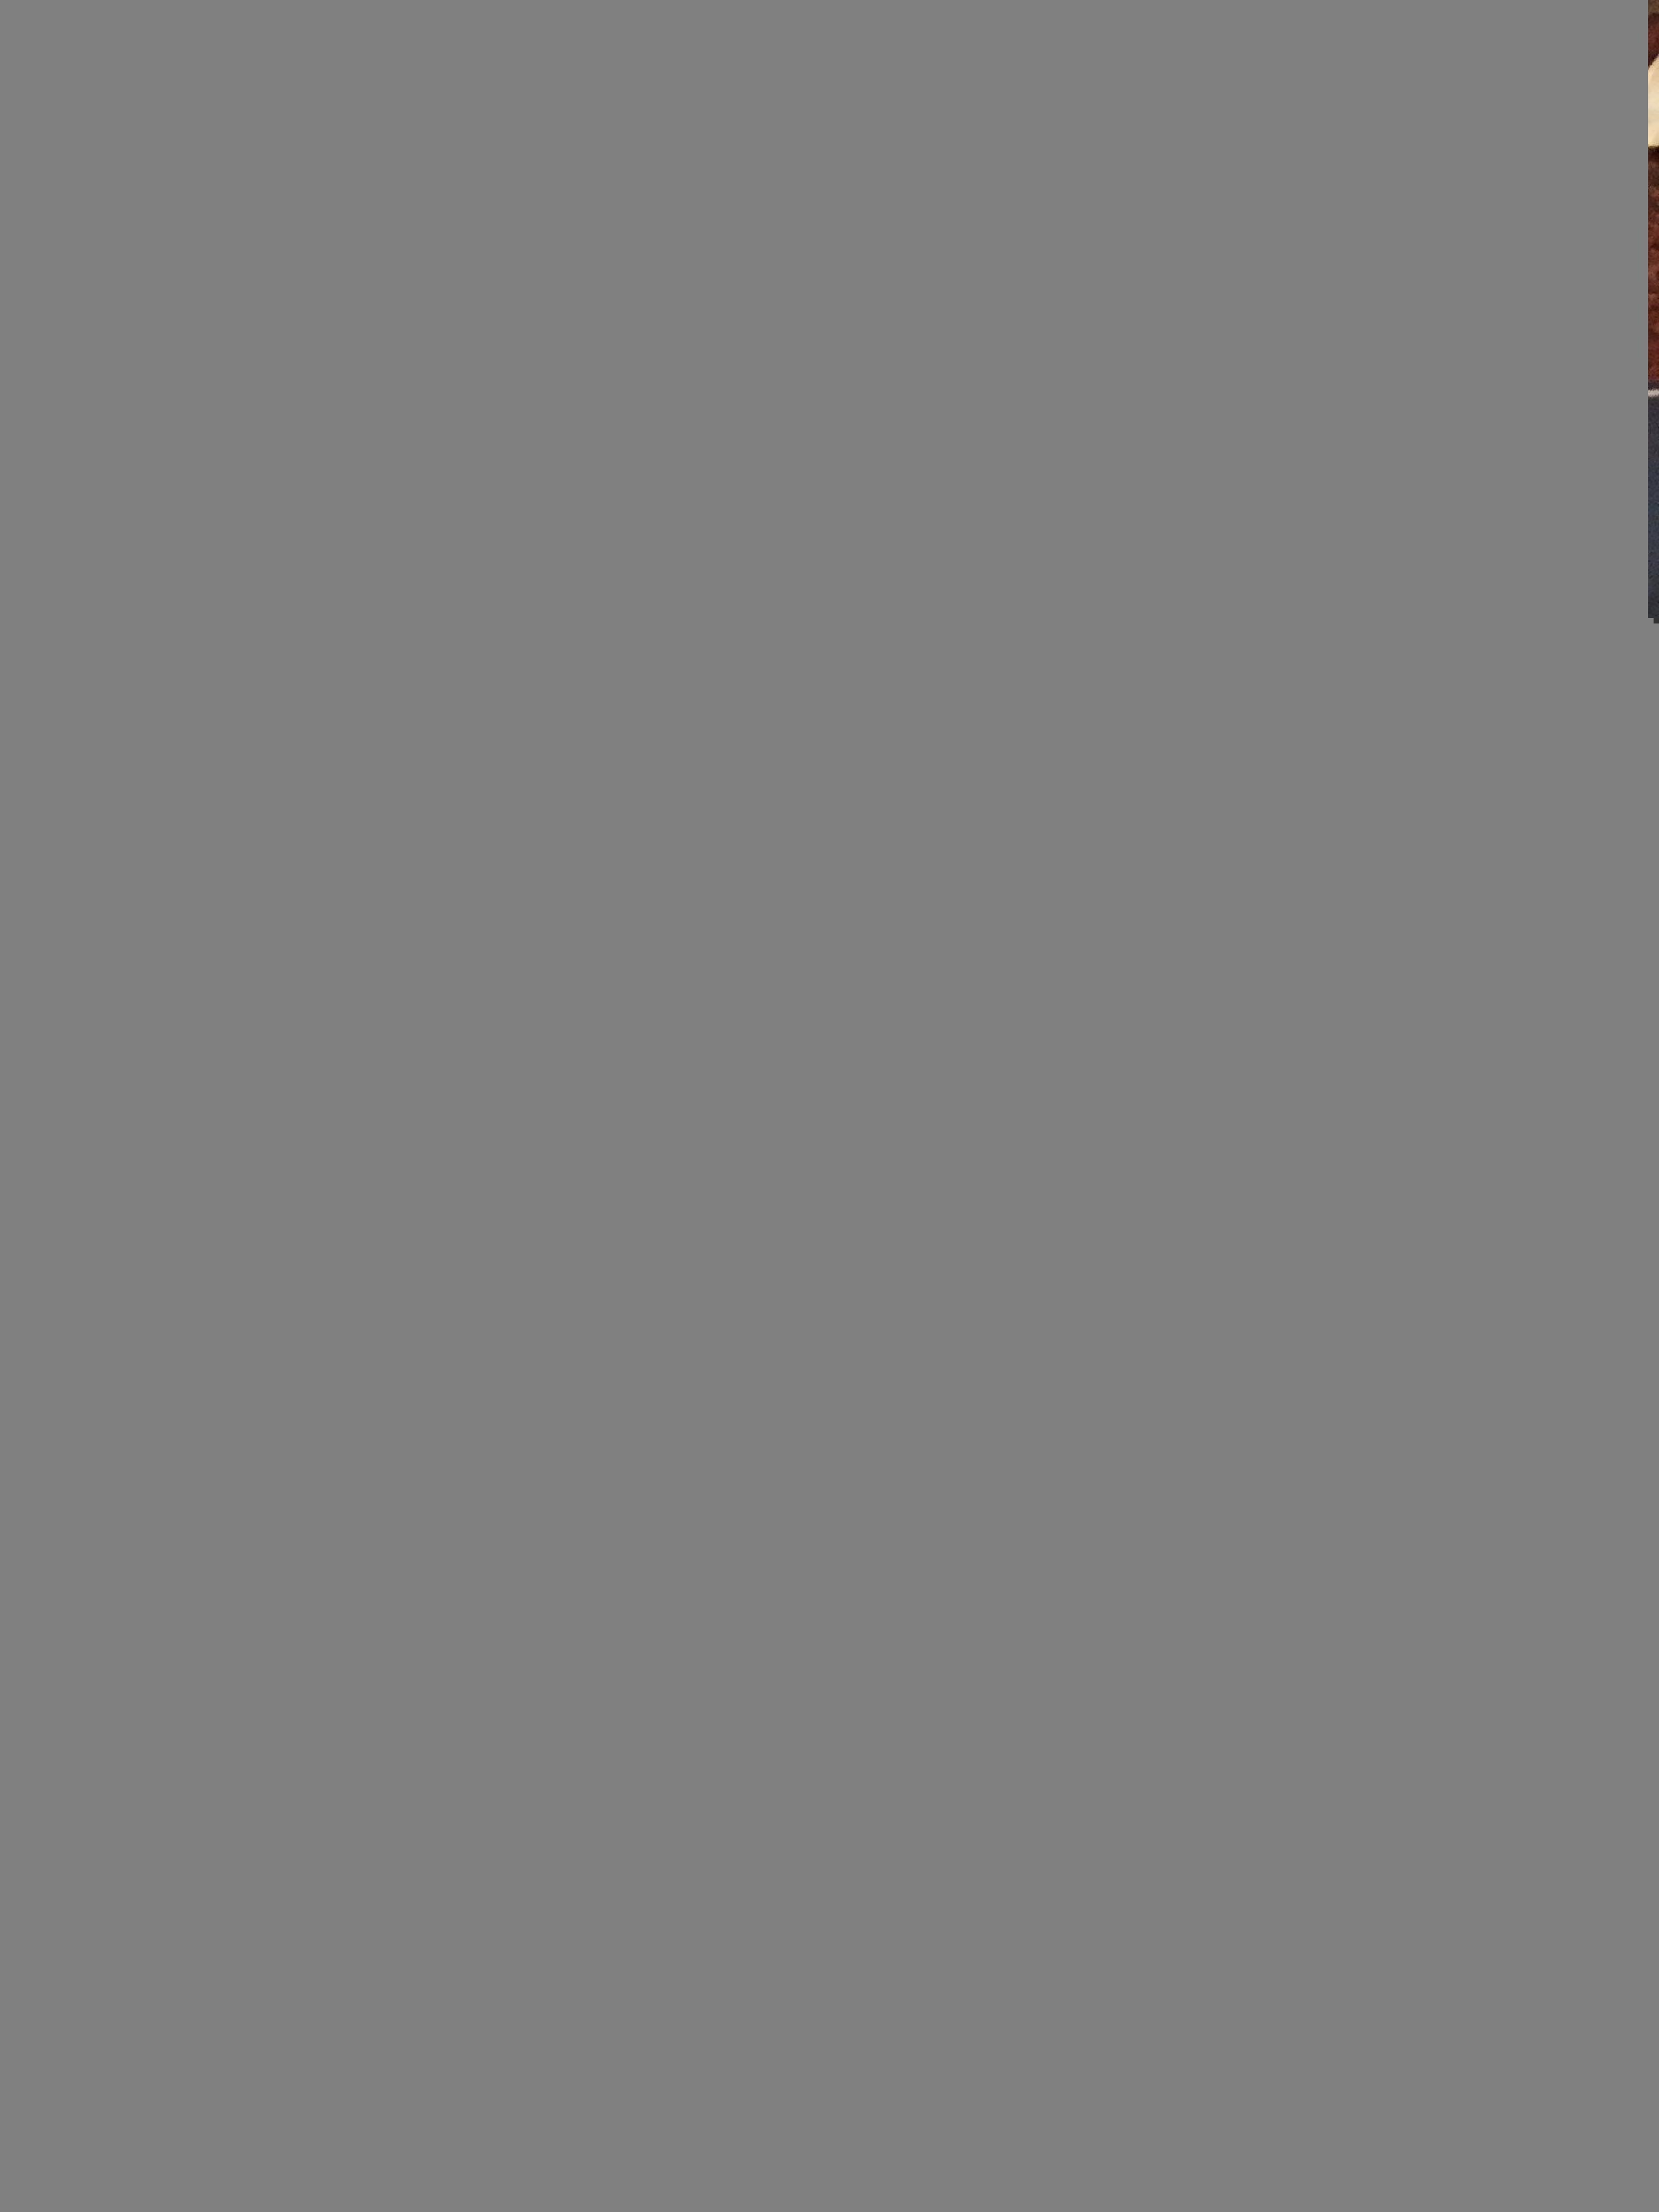 nike huarache 4 lacrosse cleats-white/navy 00267363 cheaponsale